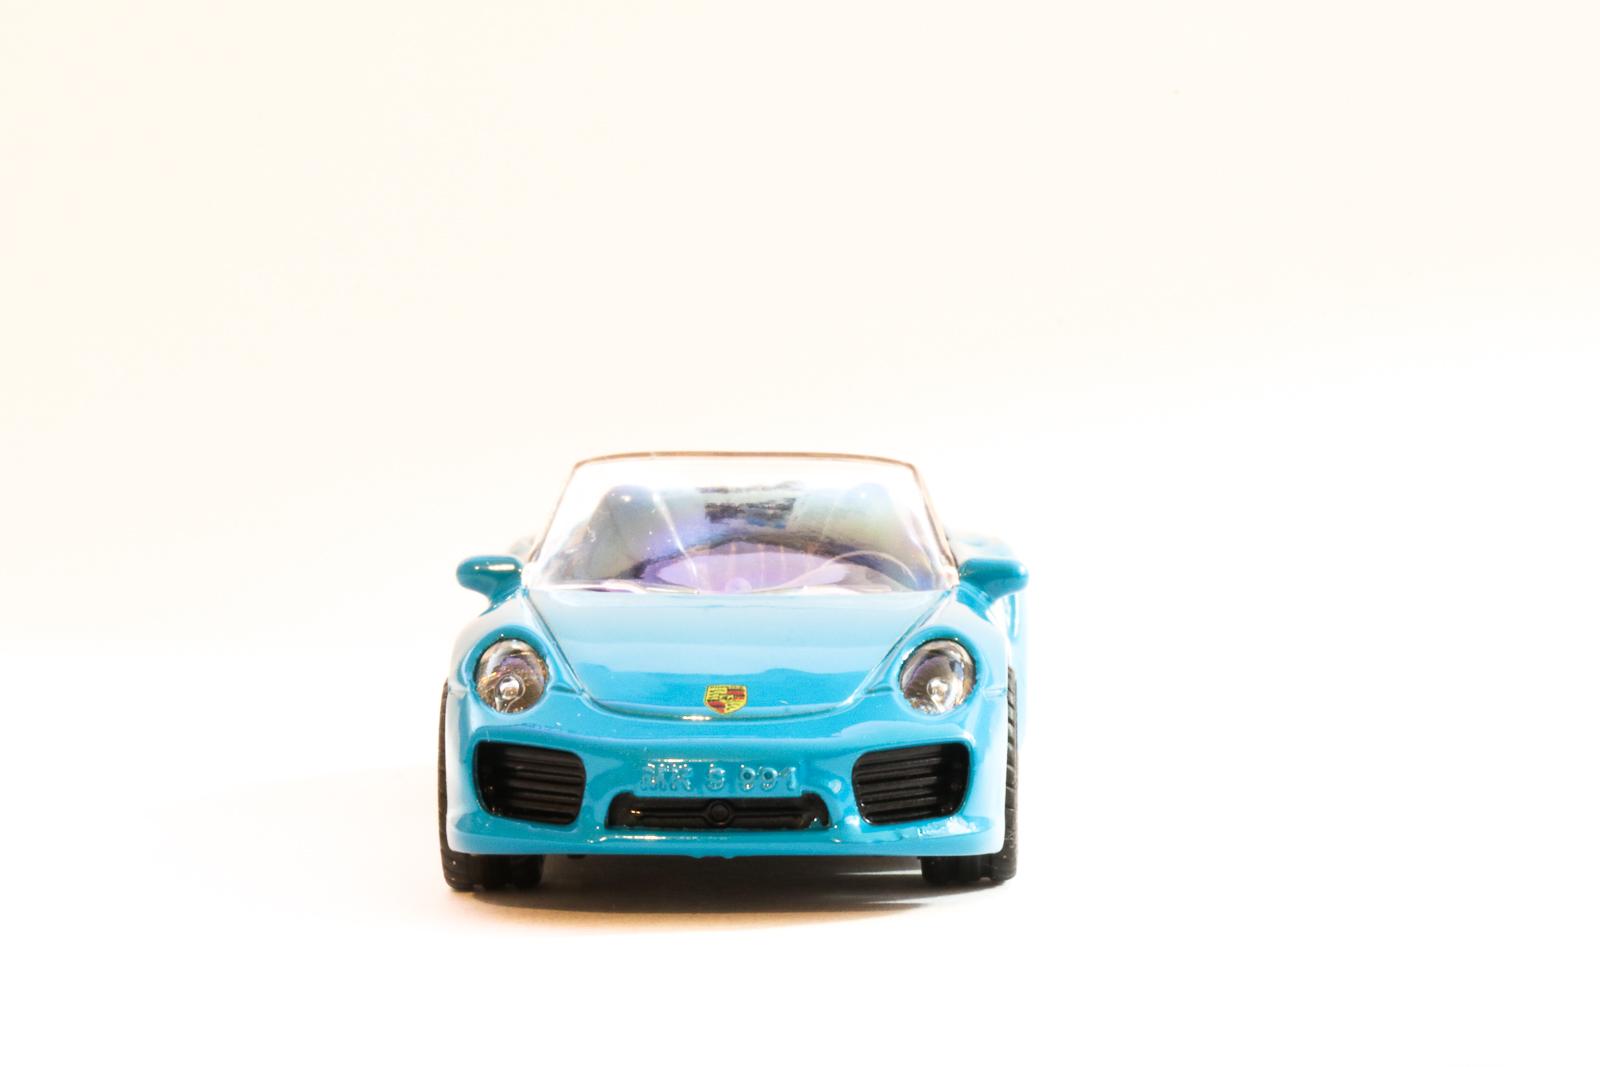 Spielzeug Autos, Lkw & Busse Siku 1523 Porsche 911 Turbo S Cabriolet Neu Auto Pkw Rennauto Modellauto